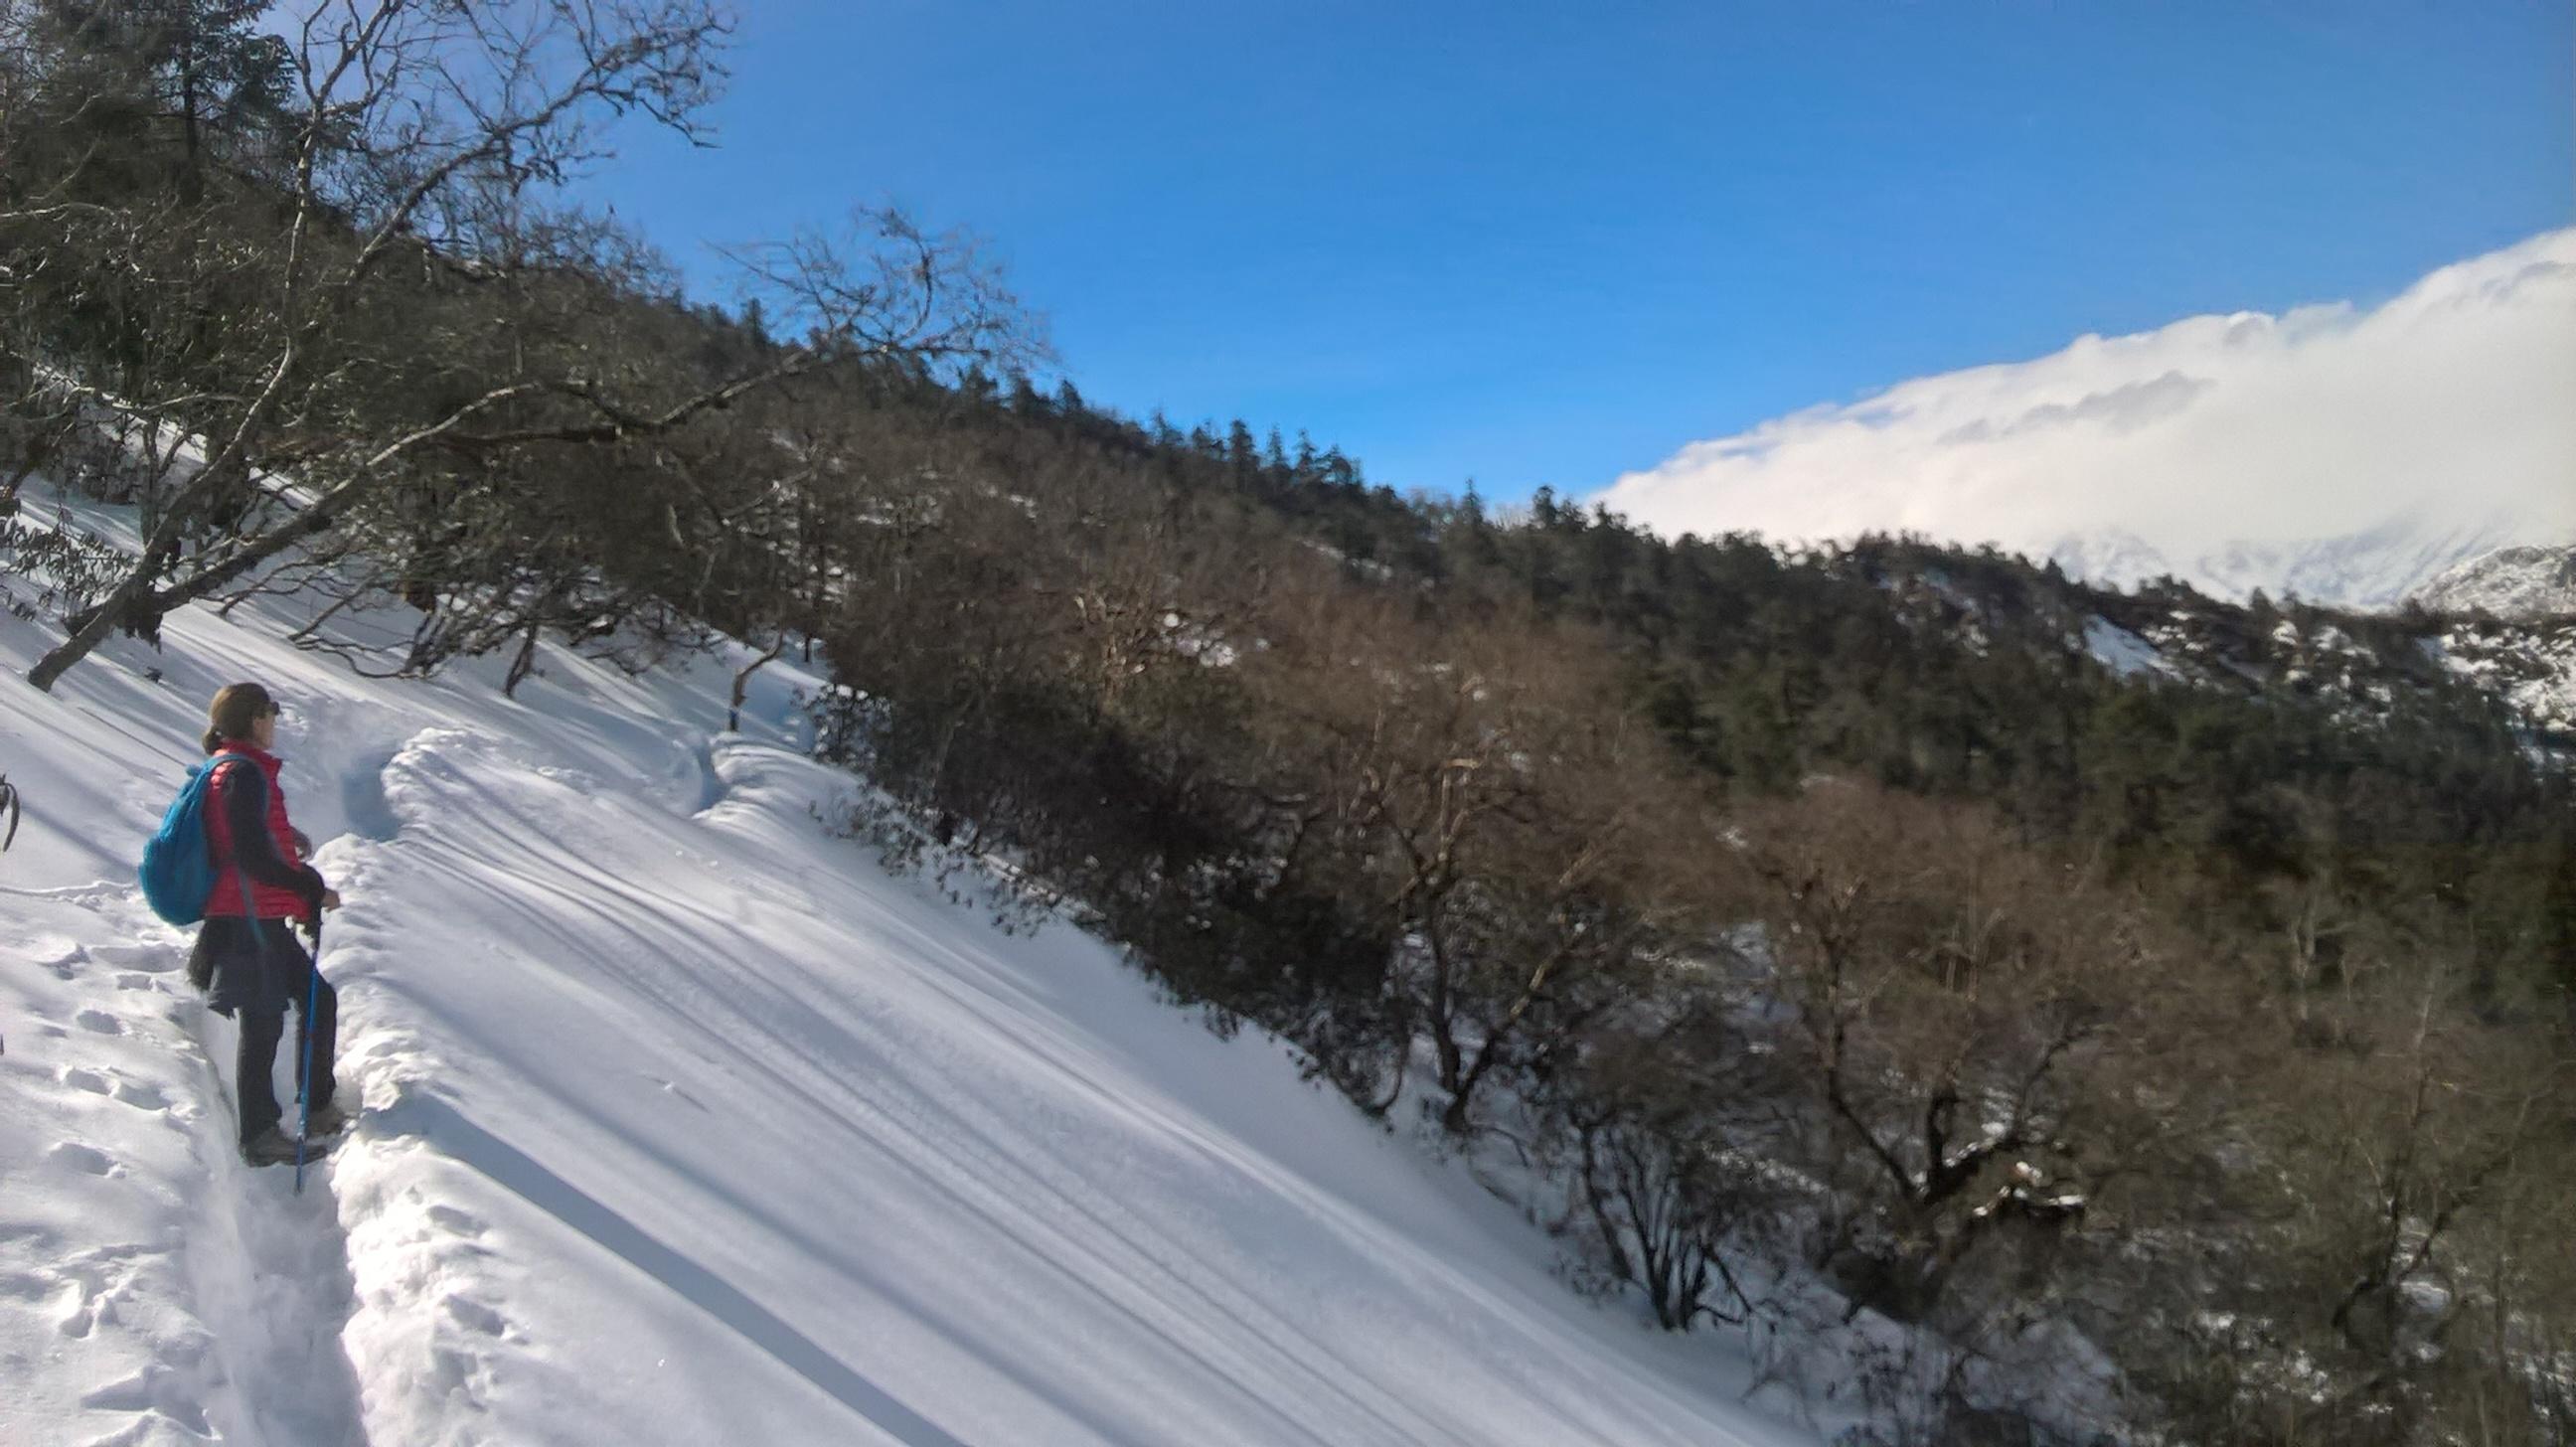 The Snow Trek to Muldai Viewpoint